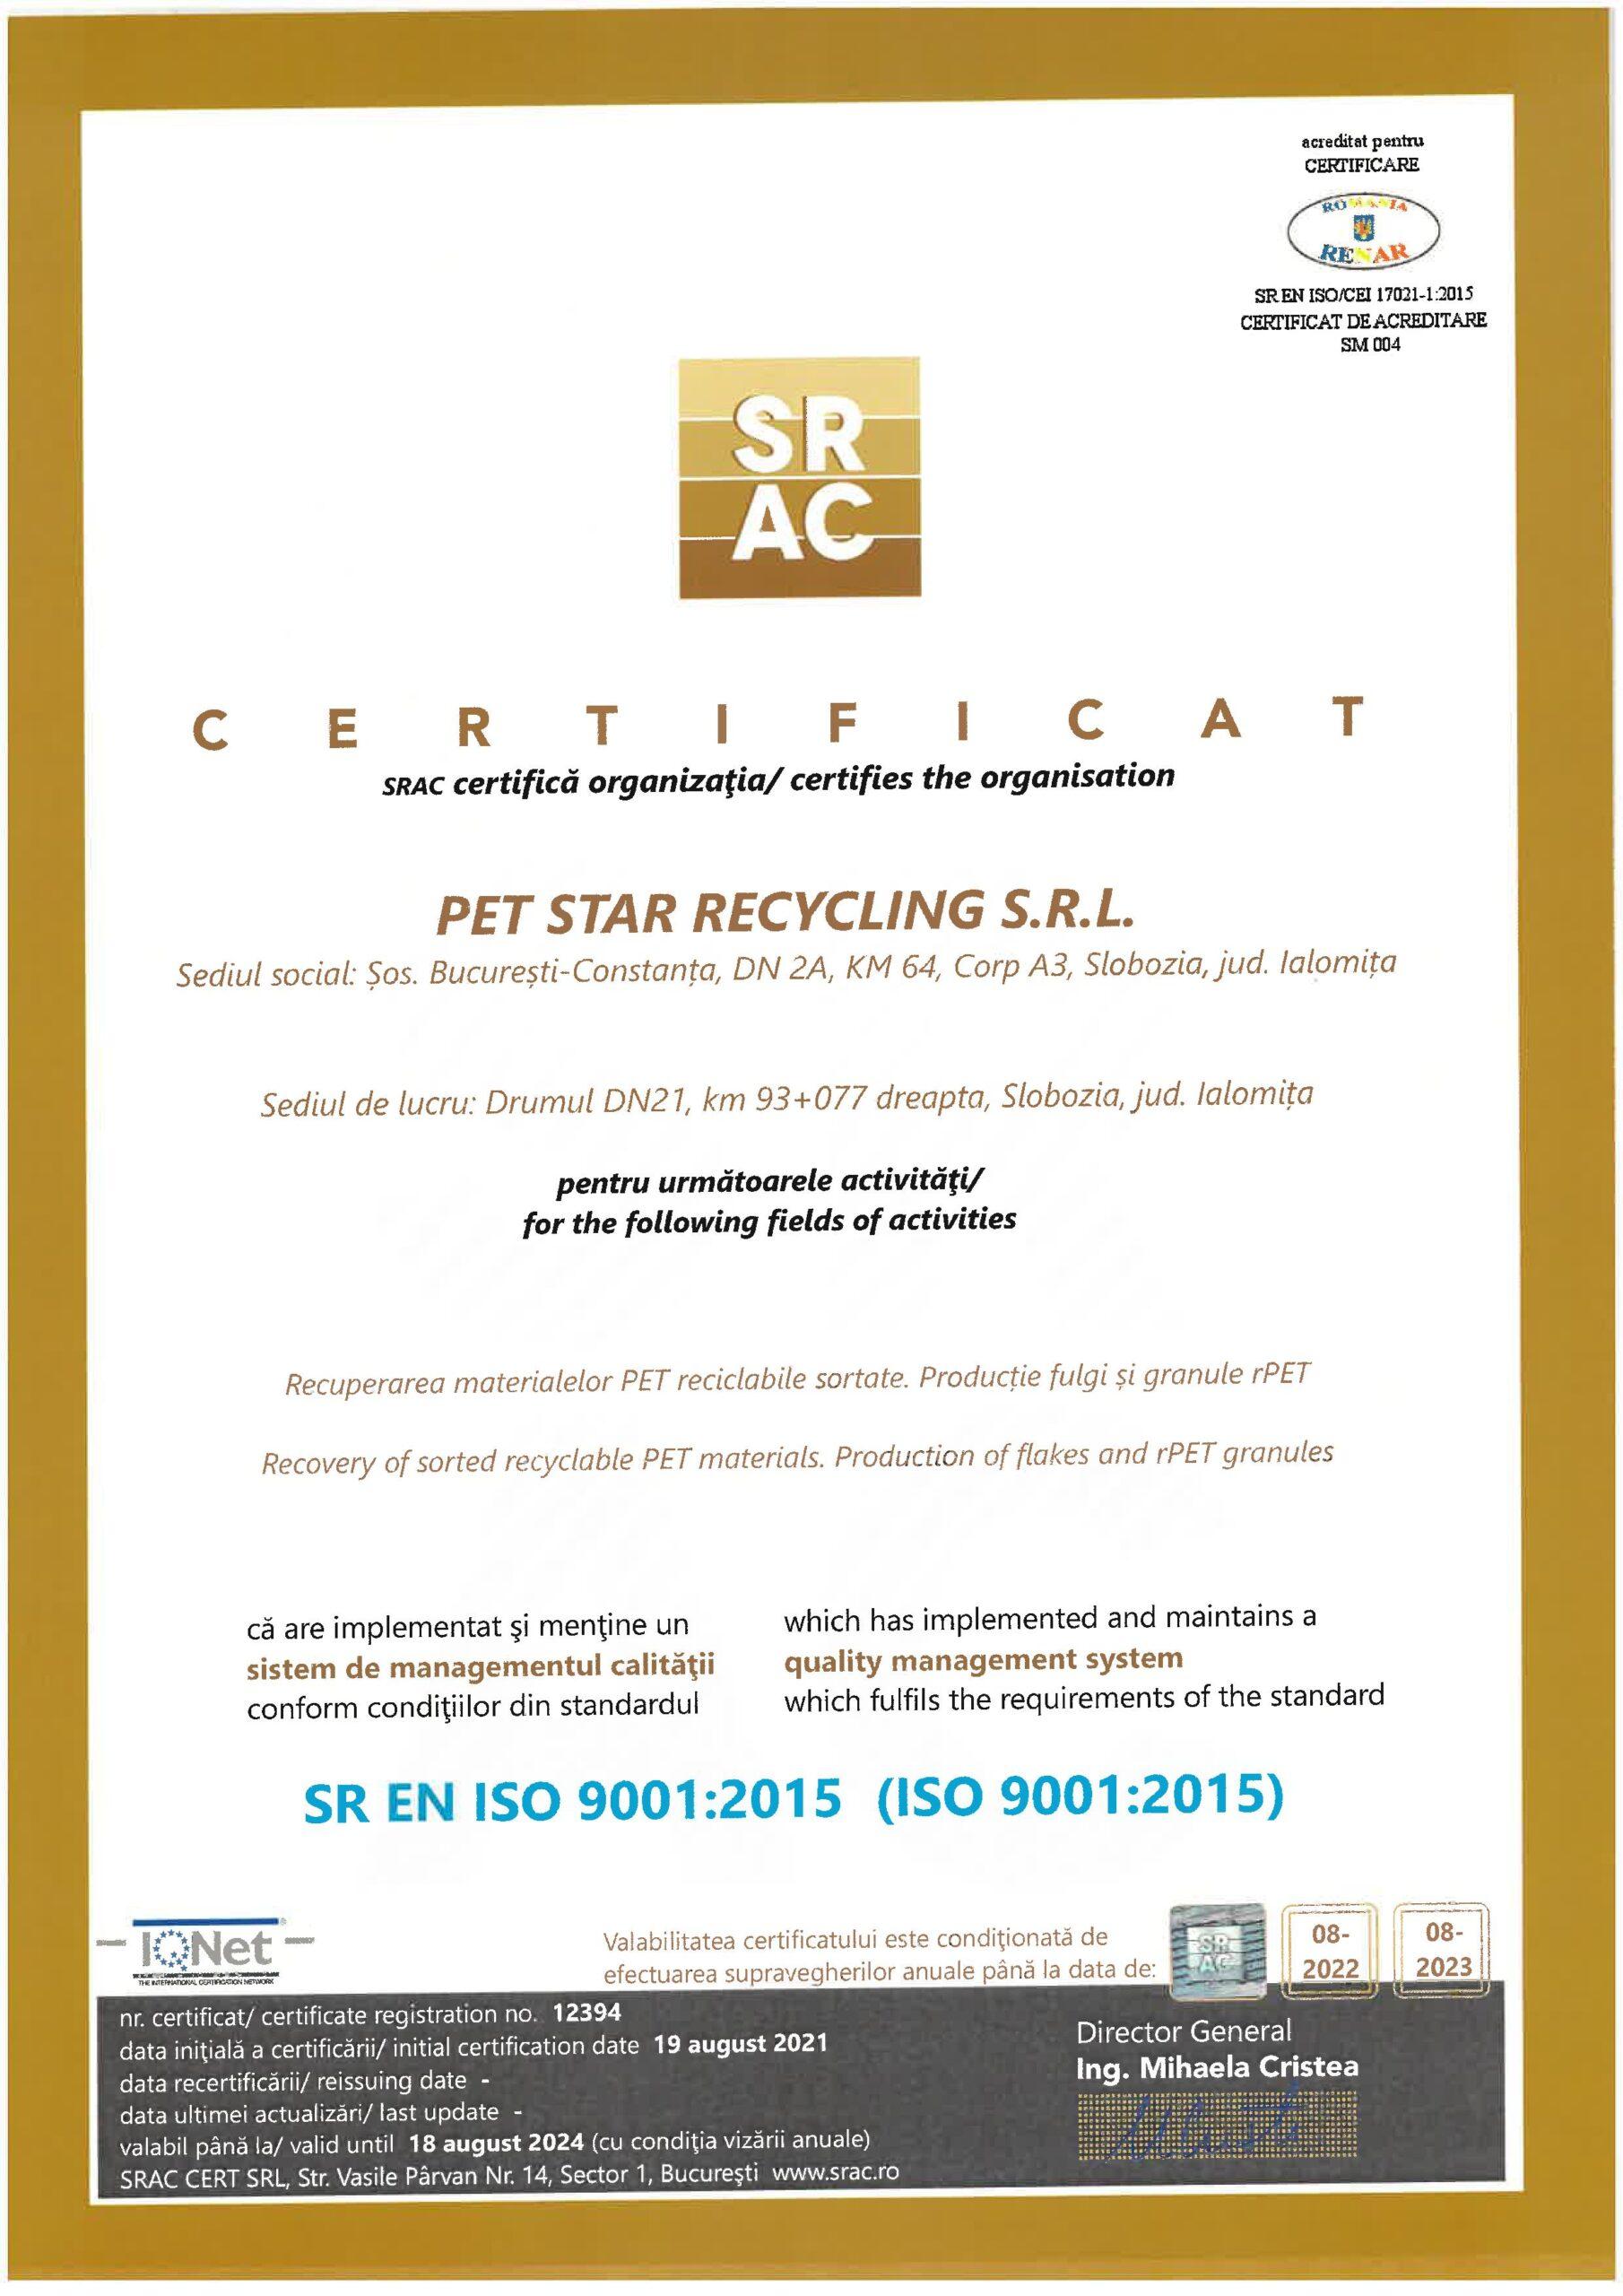 Certificare SRAC ISO 9001:2015